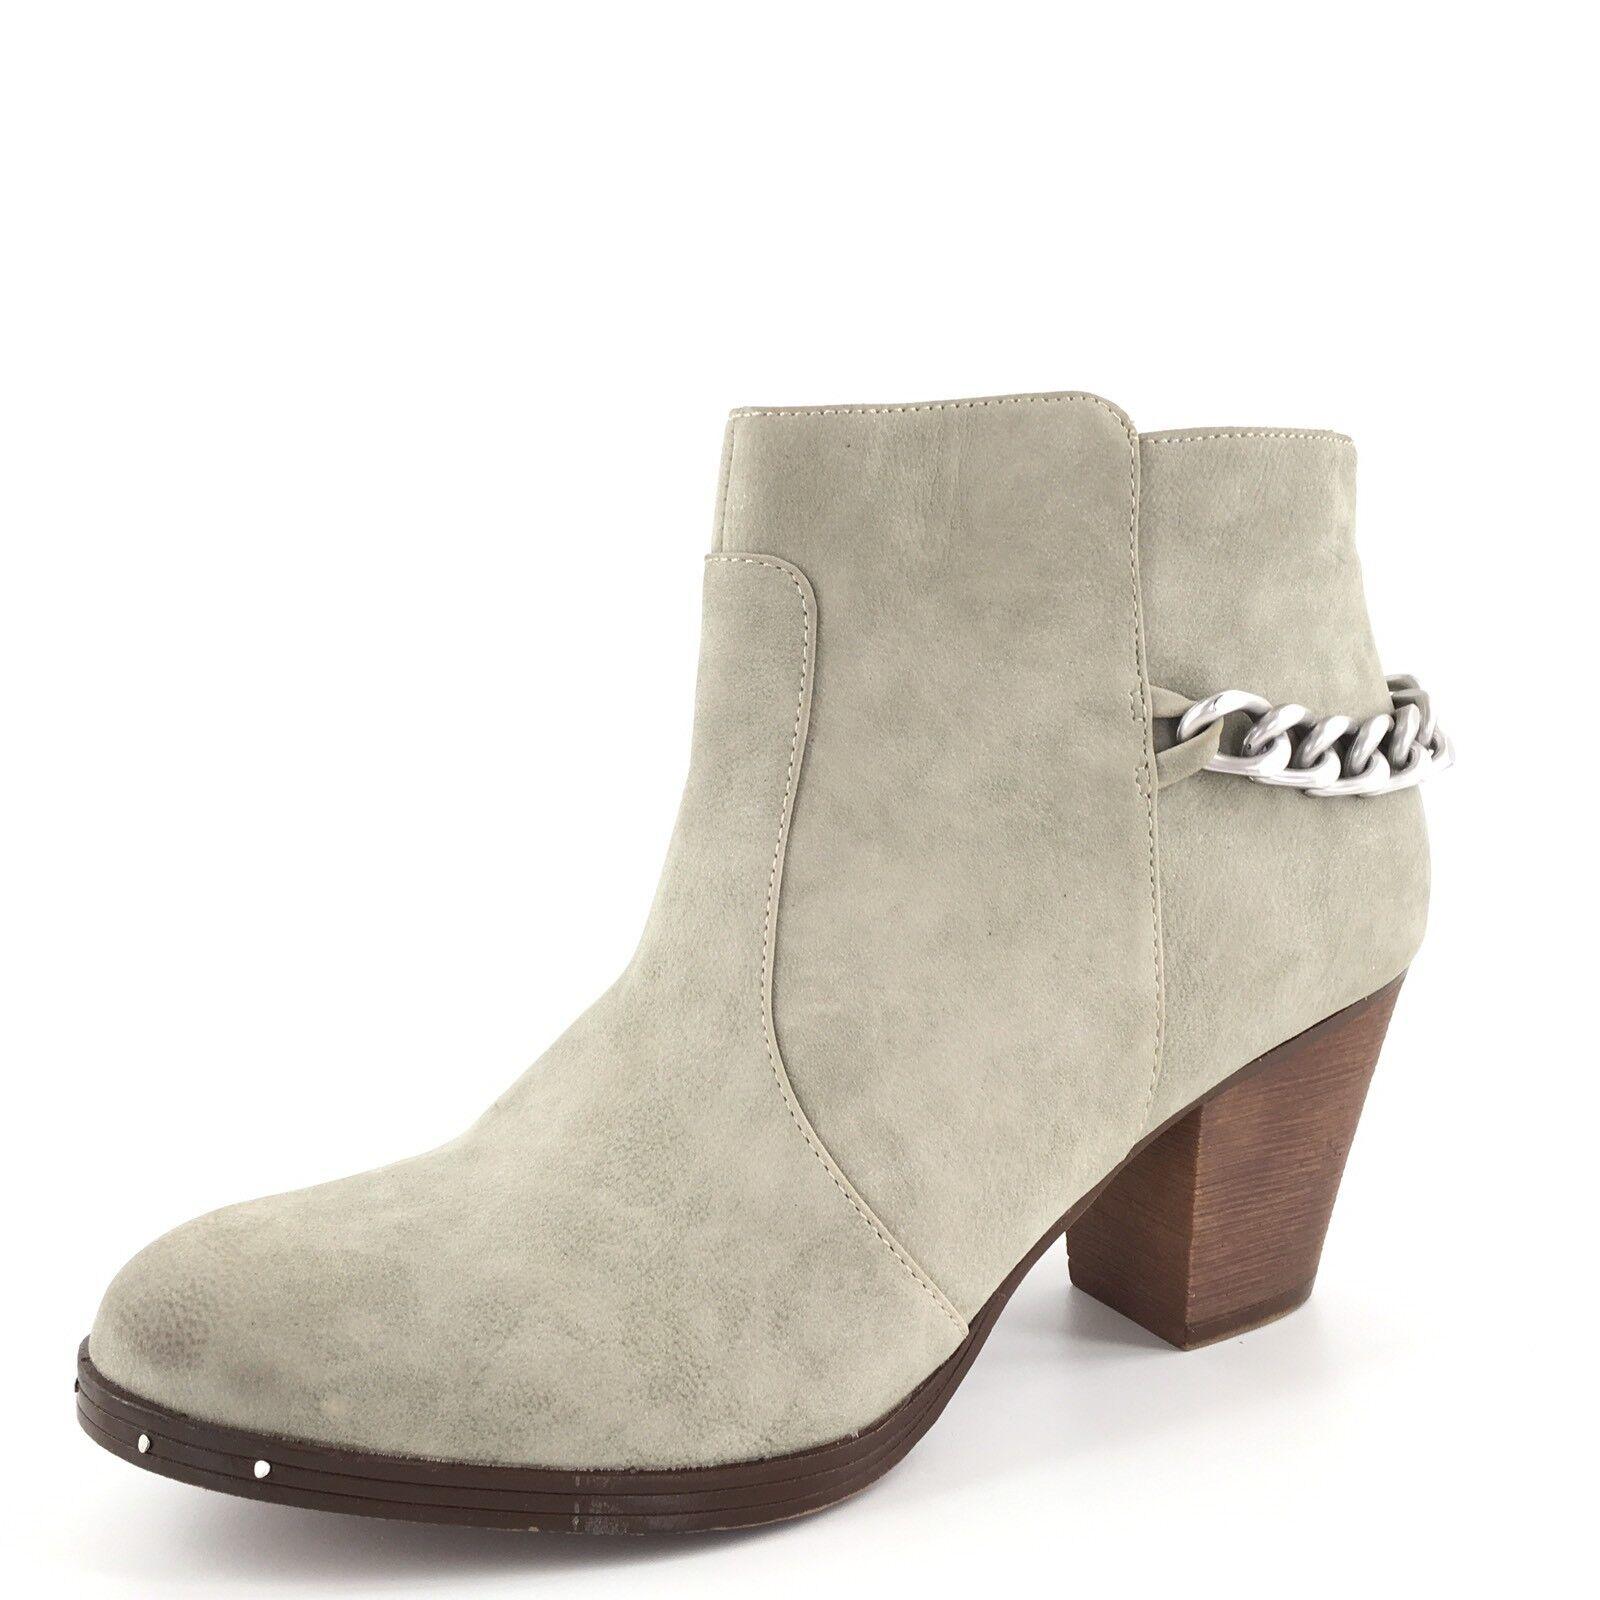 Sam Sam Sam Edelman Circus  Janna  Stone Leather Ankle Boots Women's Size 6 M  8134a5